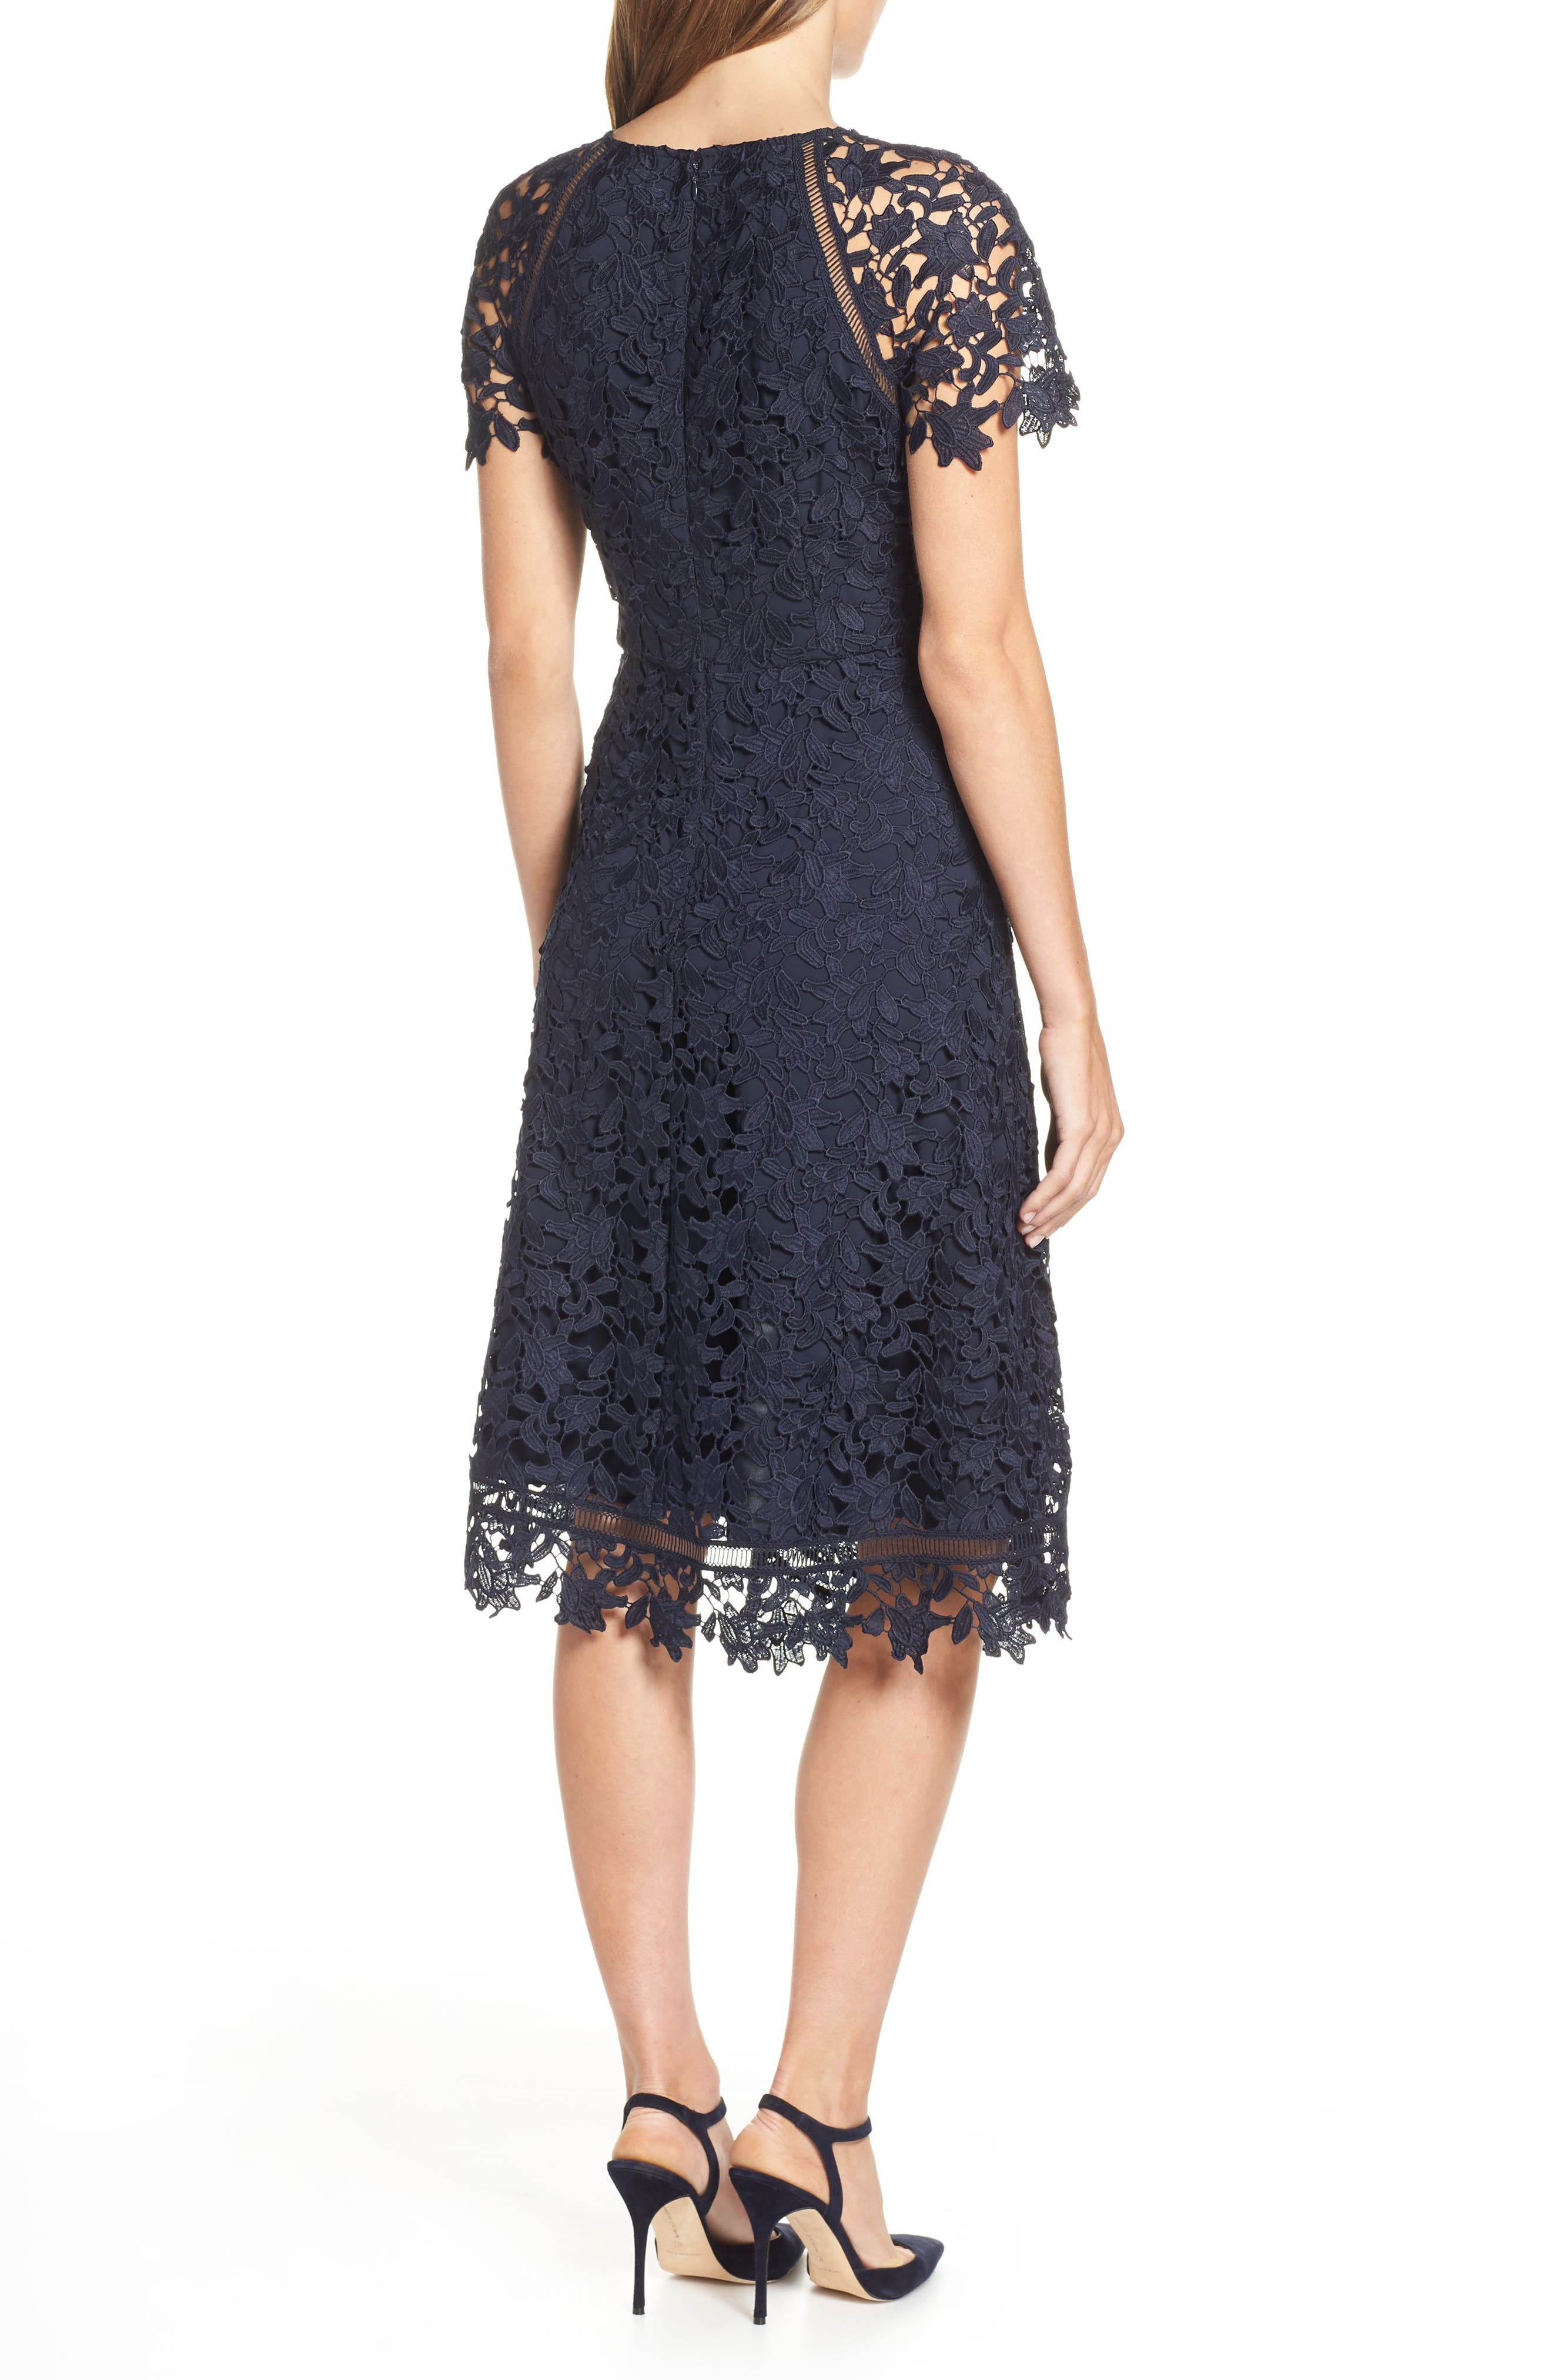 ELIZA J,                             Asymmetrical Lace Dress,                             Alternate thumbnail 2, color,                             NAVY